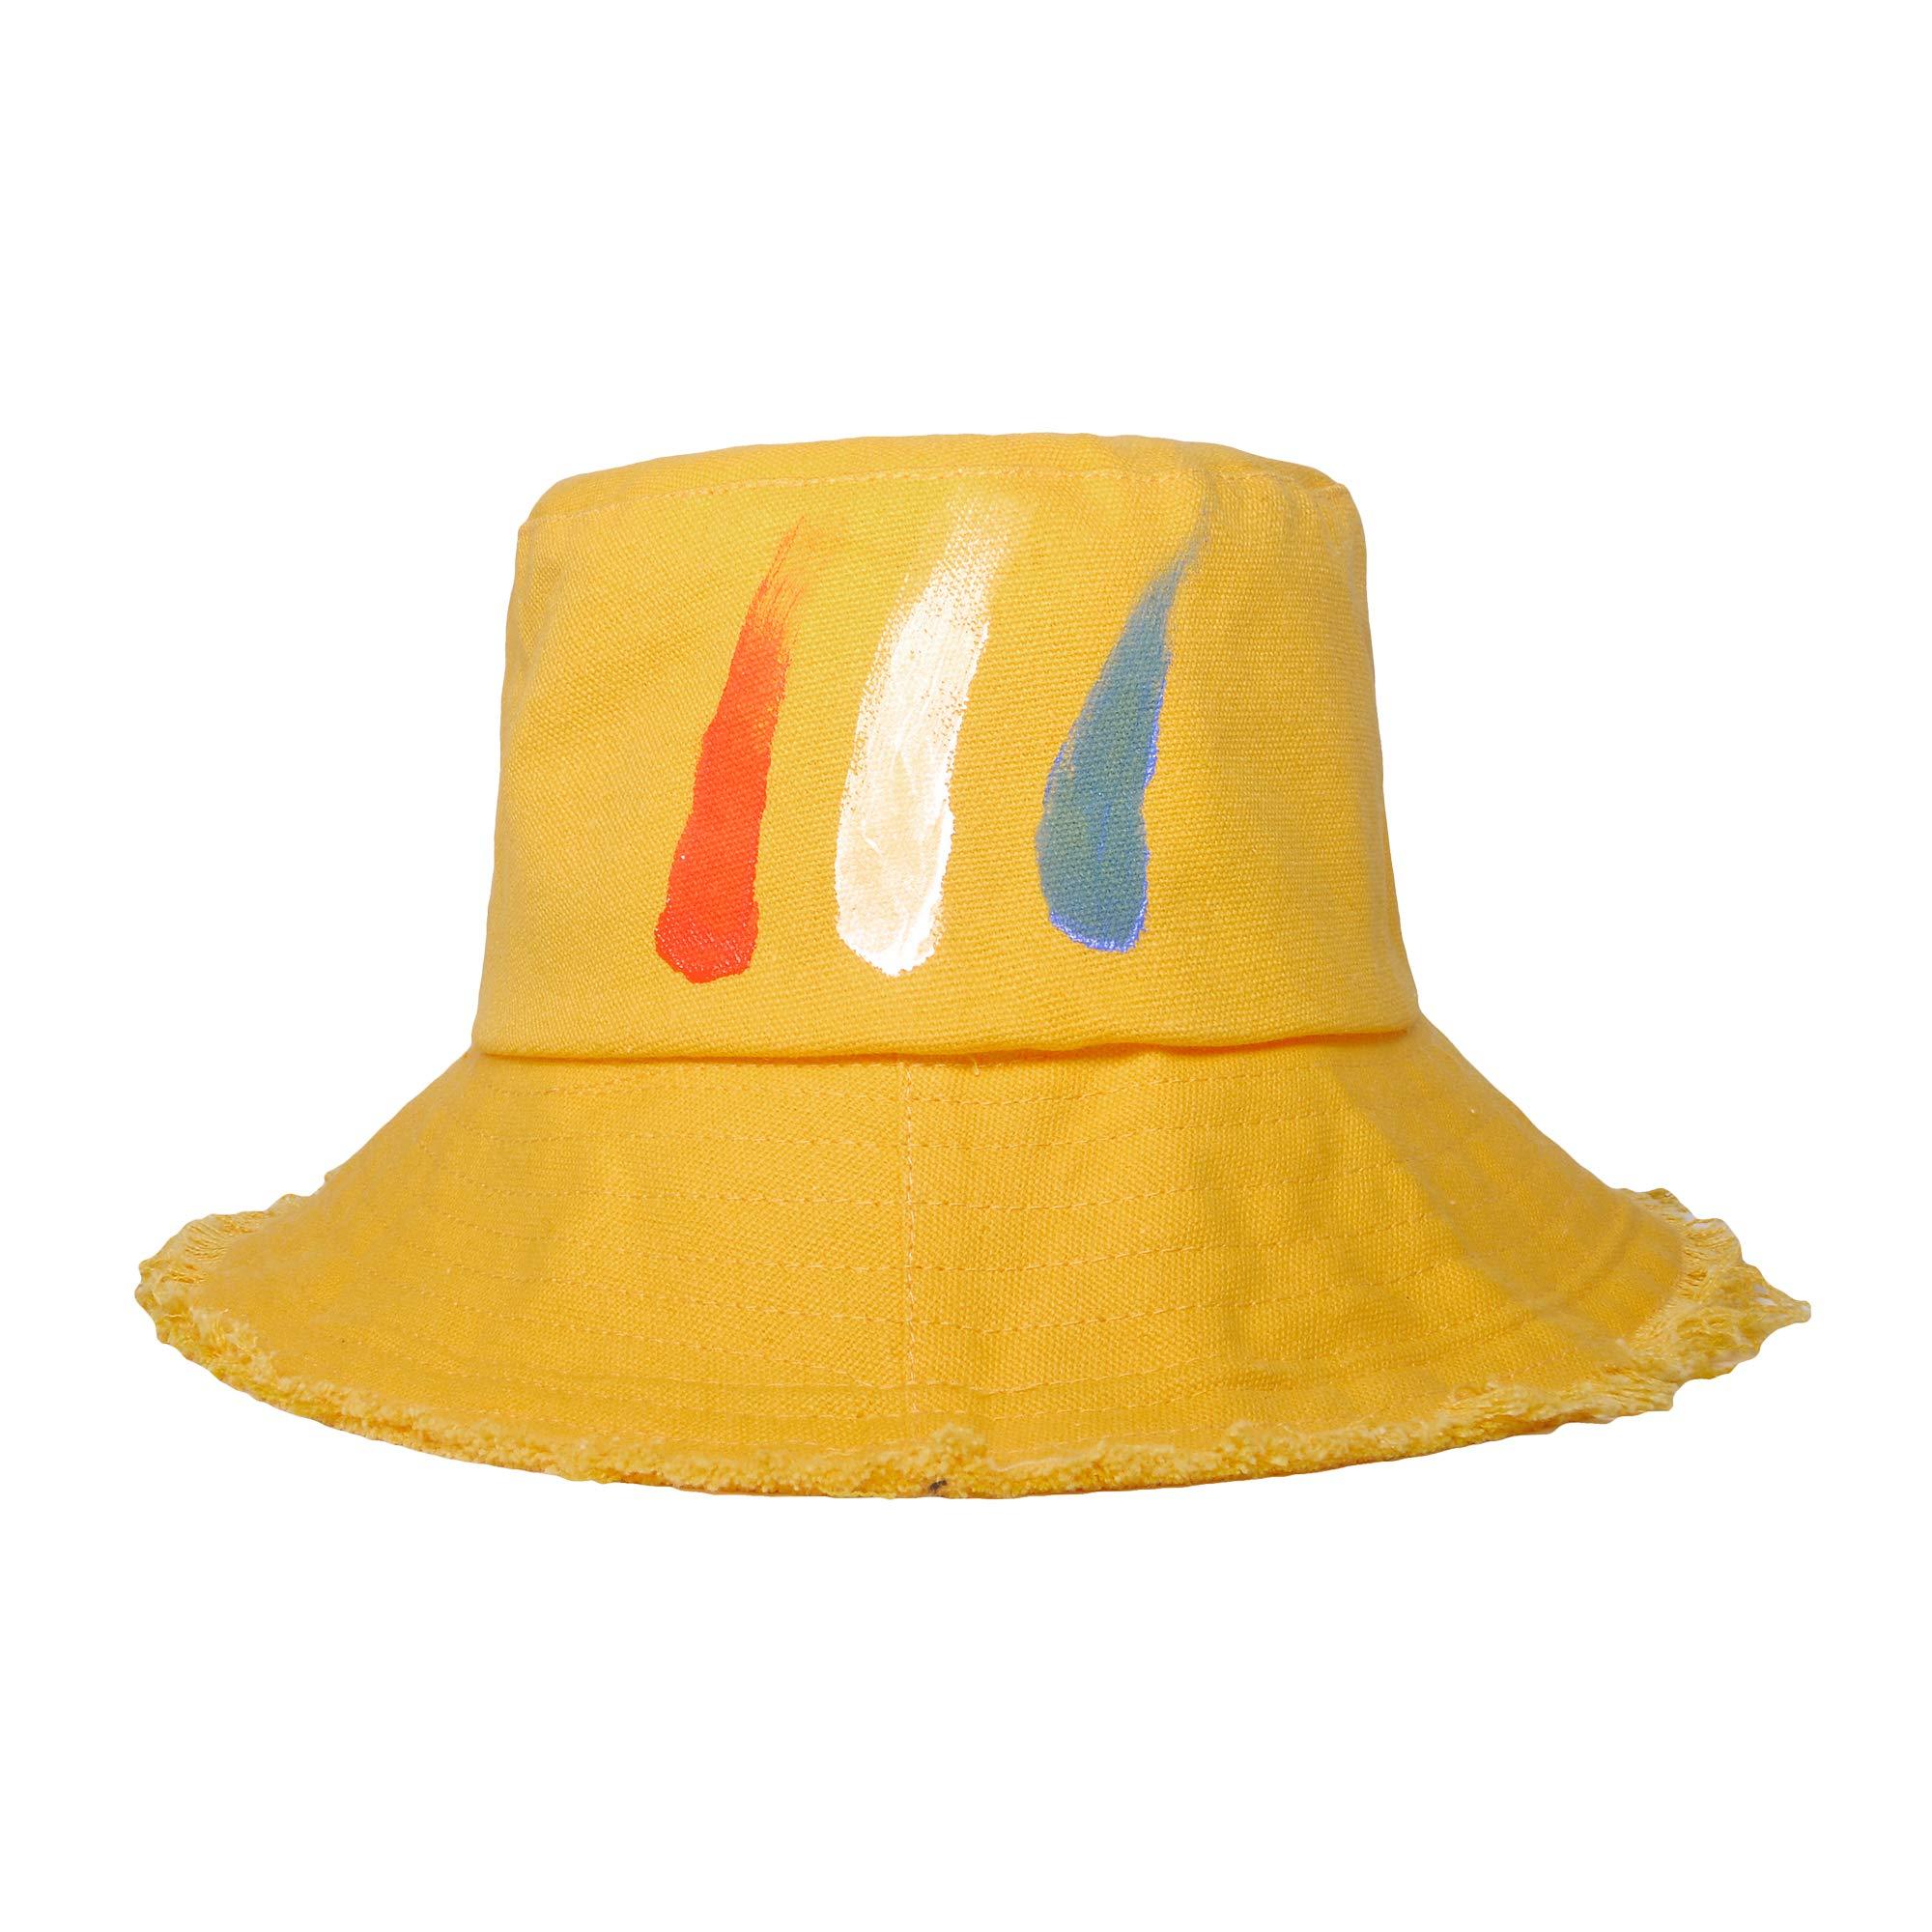 ZLYC Women Fashion Outdoor Washed Cotton Denim Bucket hat Sun hat (Painted Yellow)